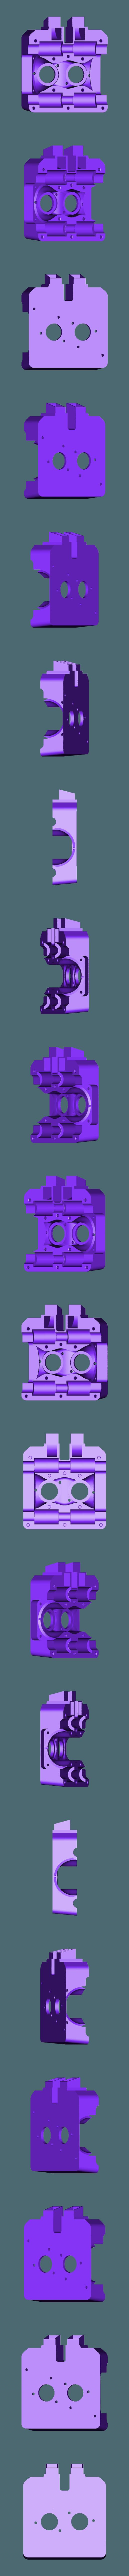 Dual_E3D_Mount_v4-4_MIDDLE.STL Download free STL file Jellyfish Mount (RigidBot Dual E3Dv6) • 3D printer object, WalterHsiao